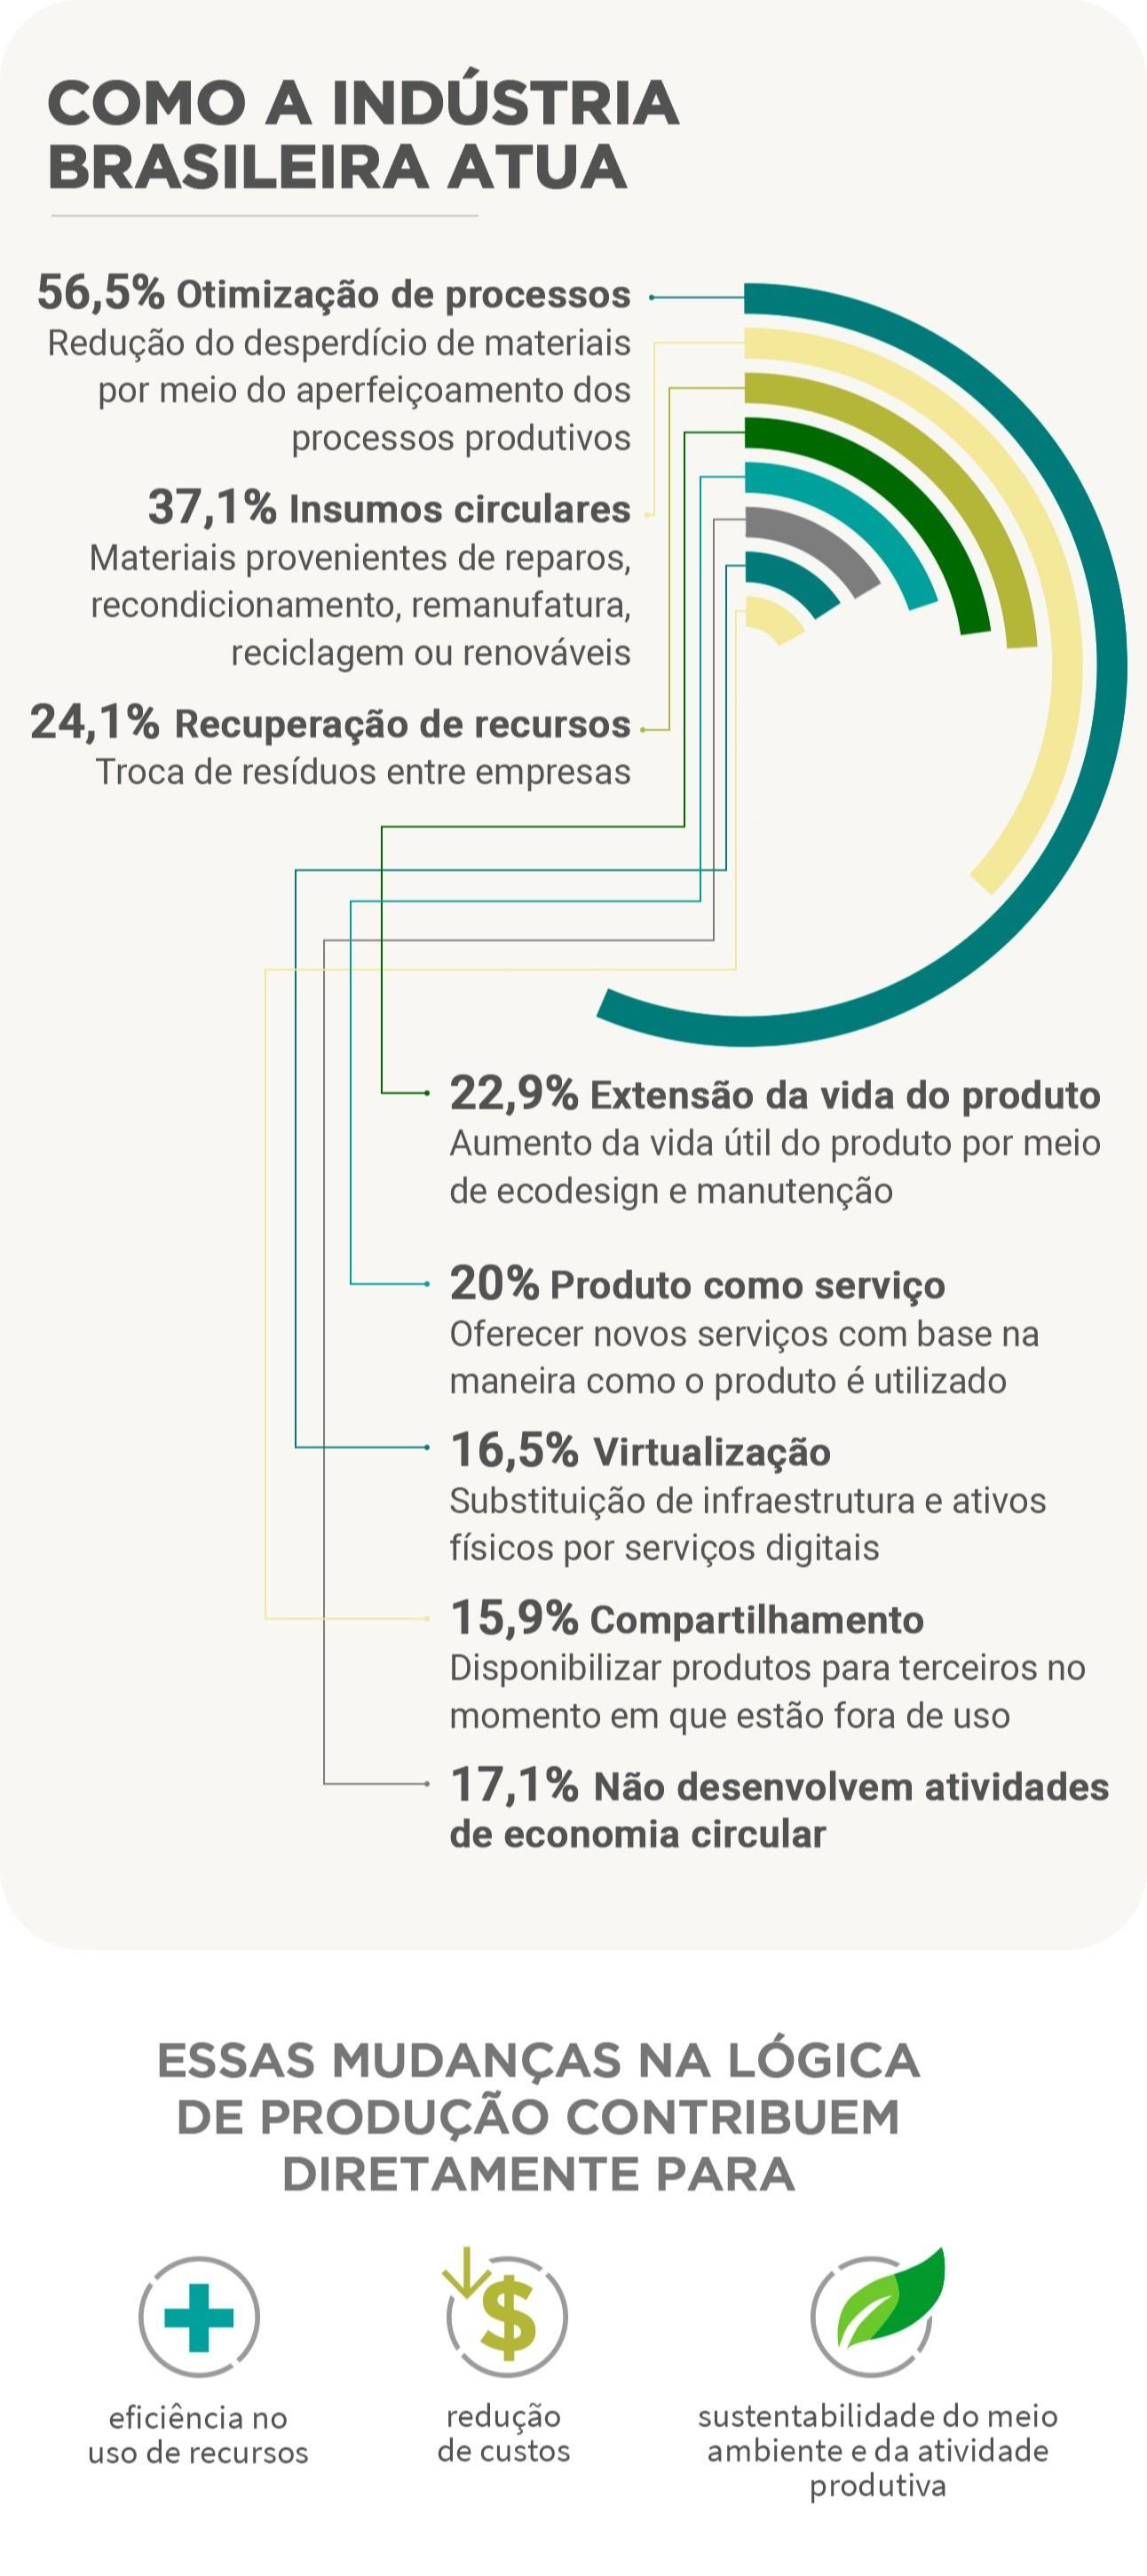 Brasil tem tudo para ser referência na economia circular